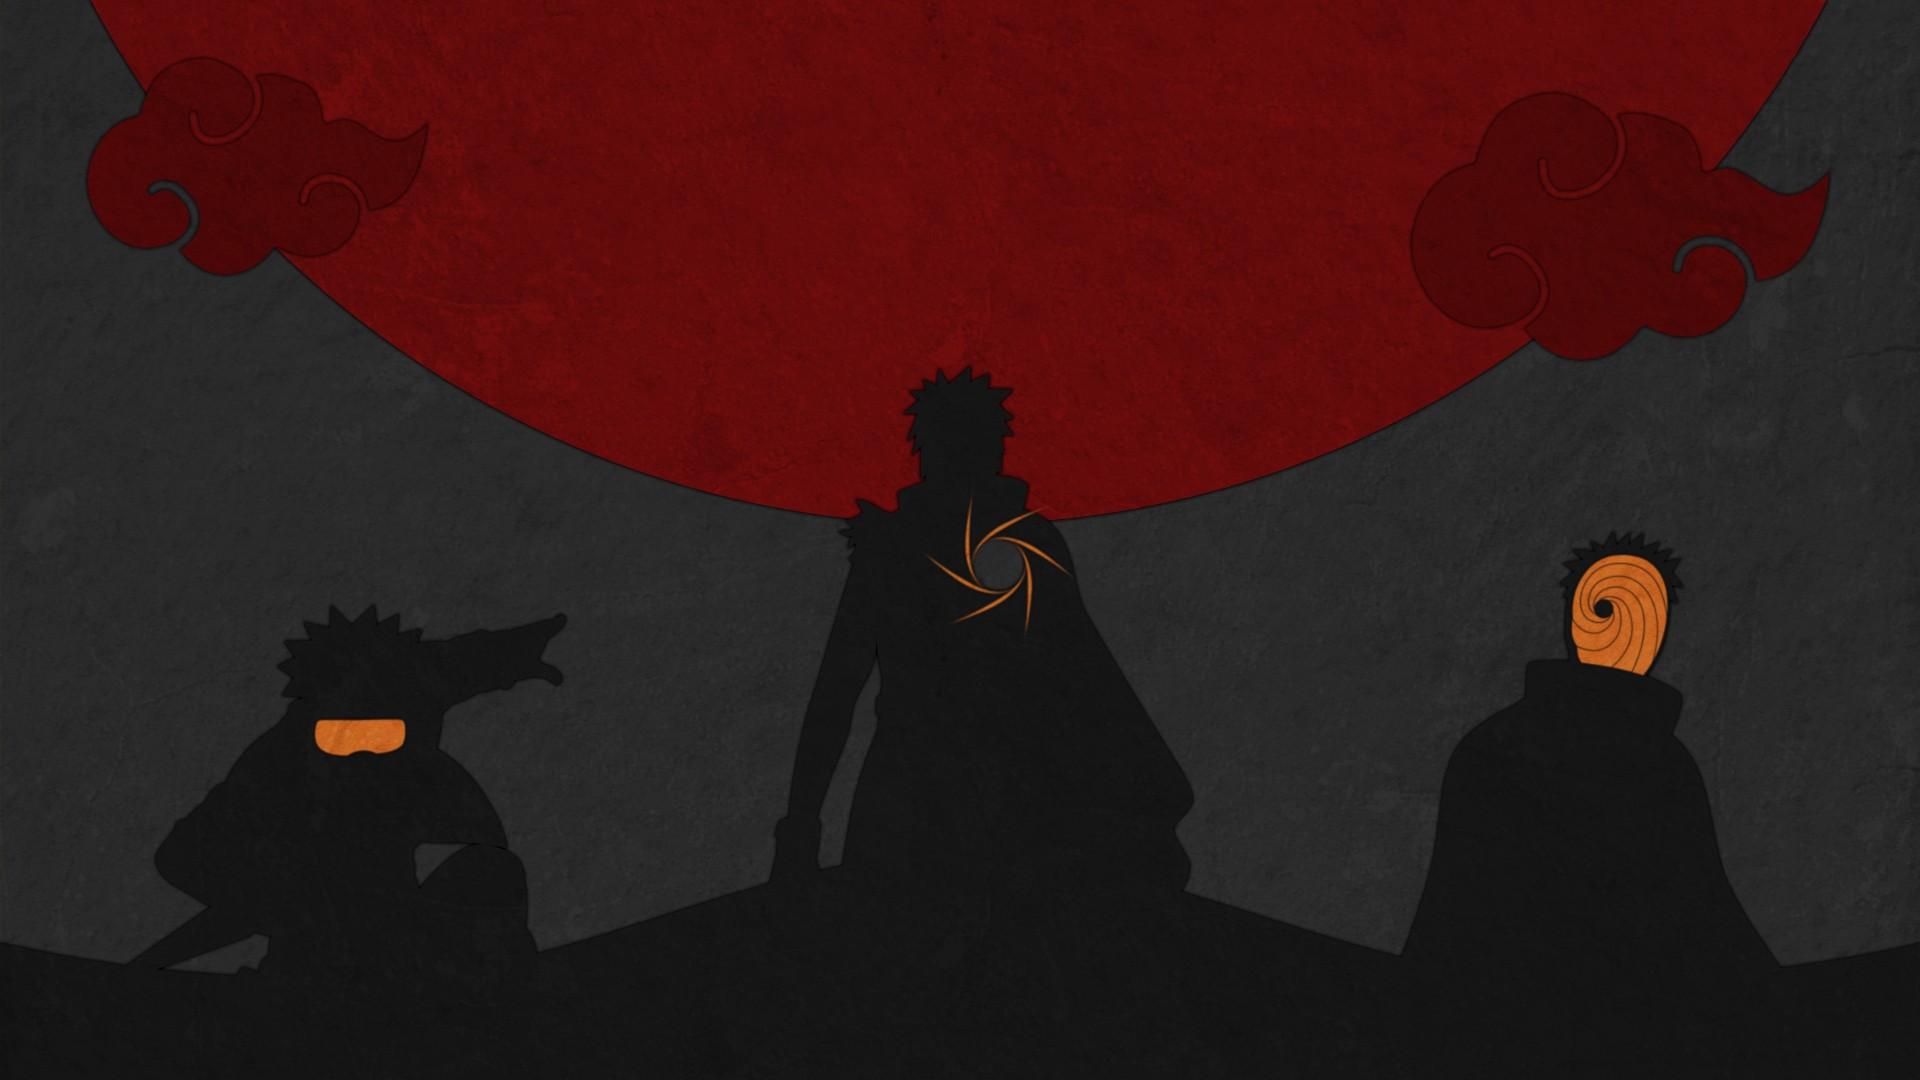 Wallpaper : illustration, silhouette, Naruto Shippuuden ...